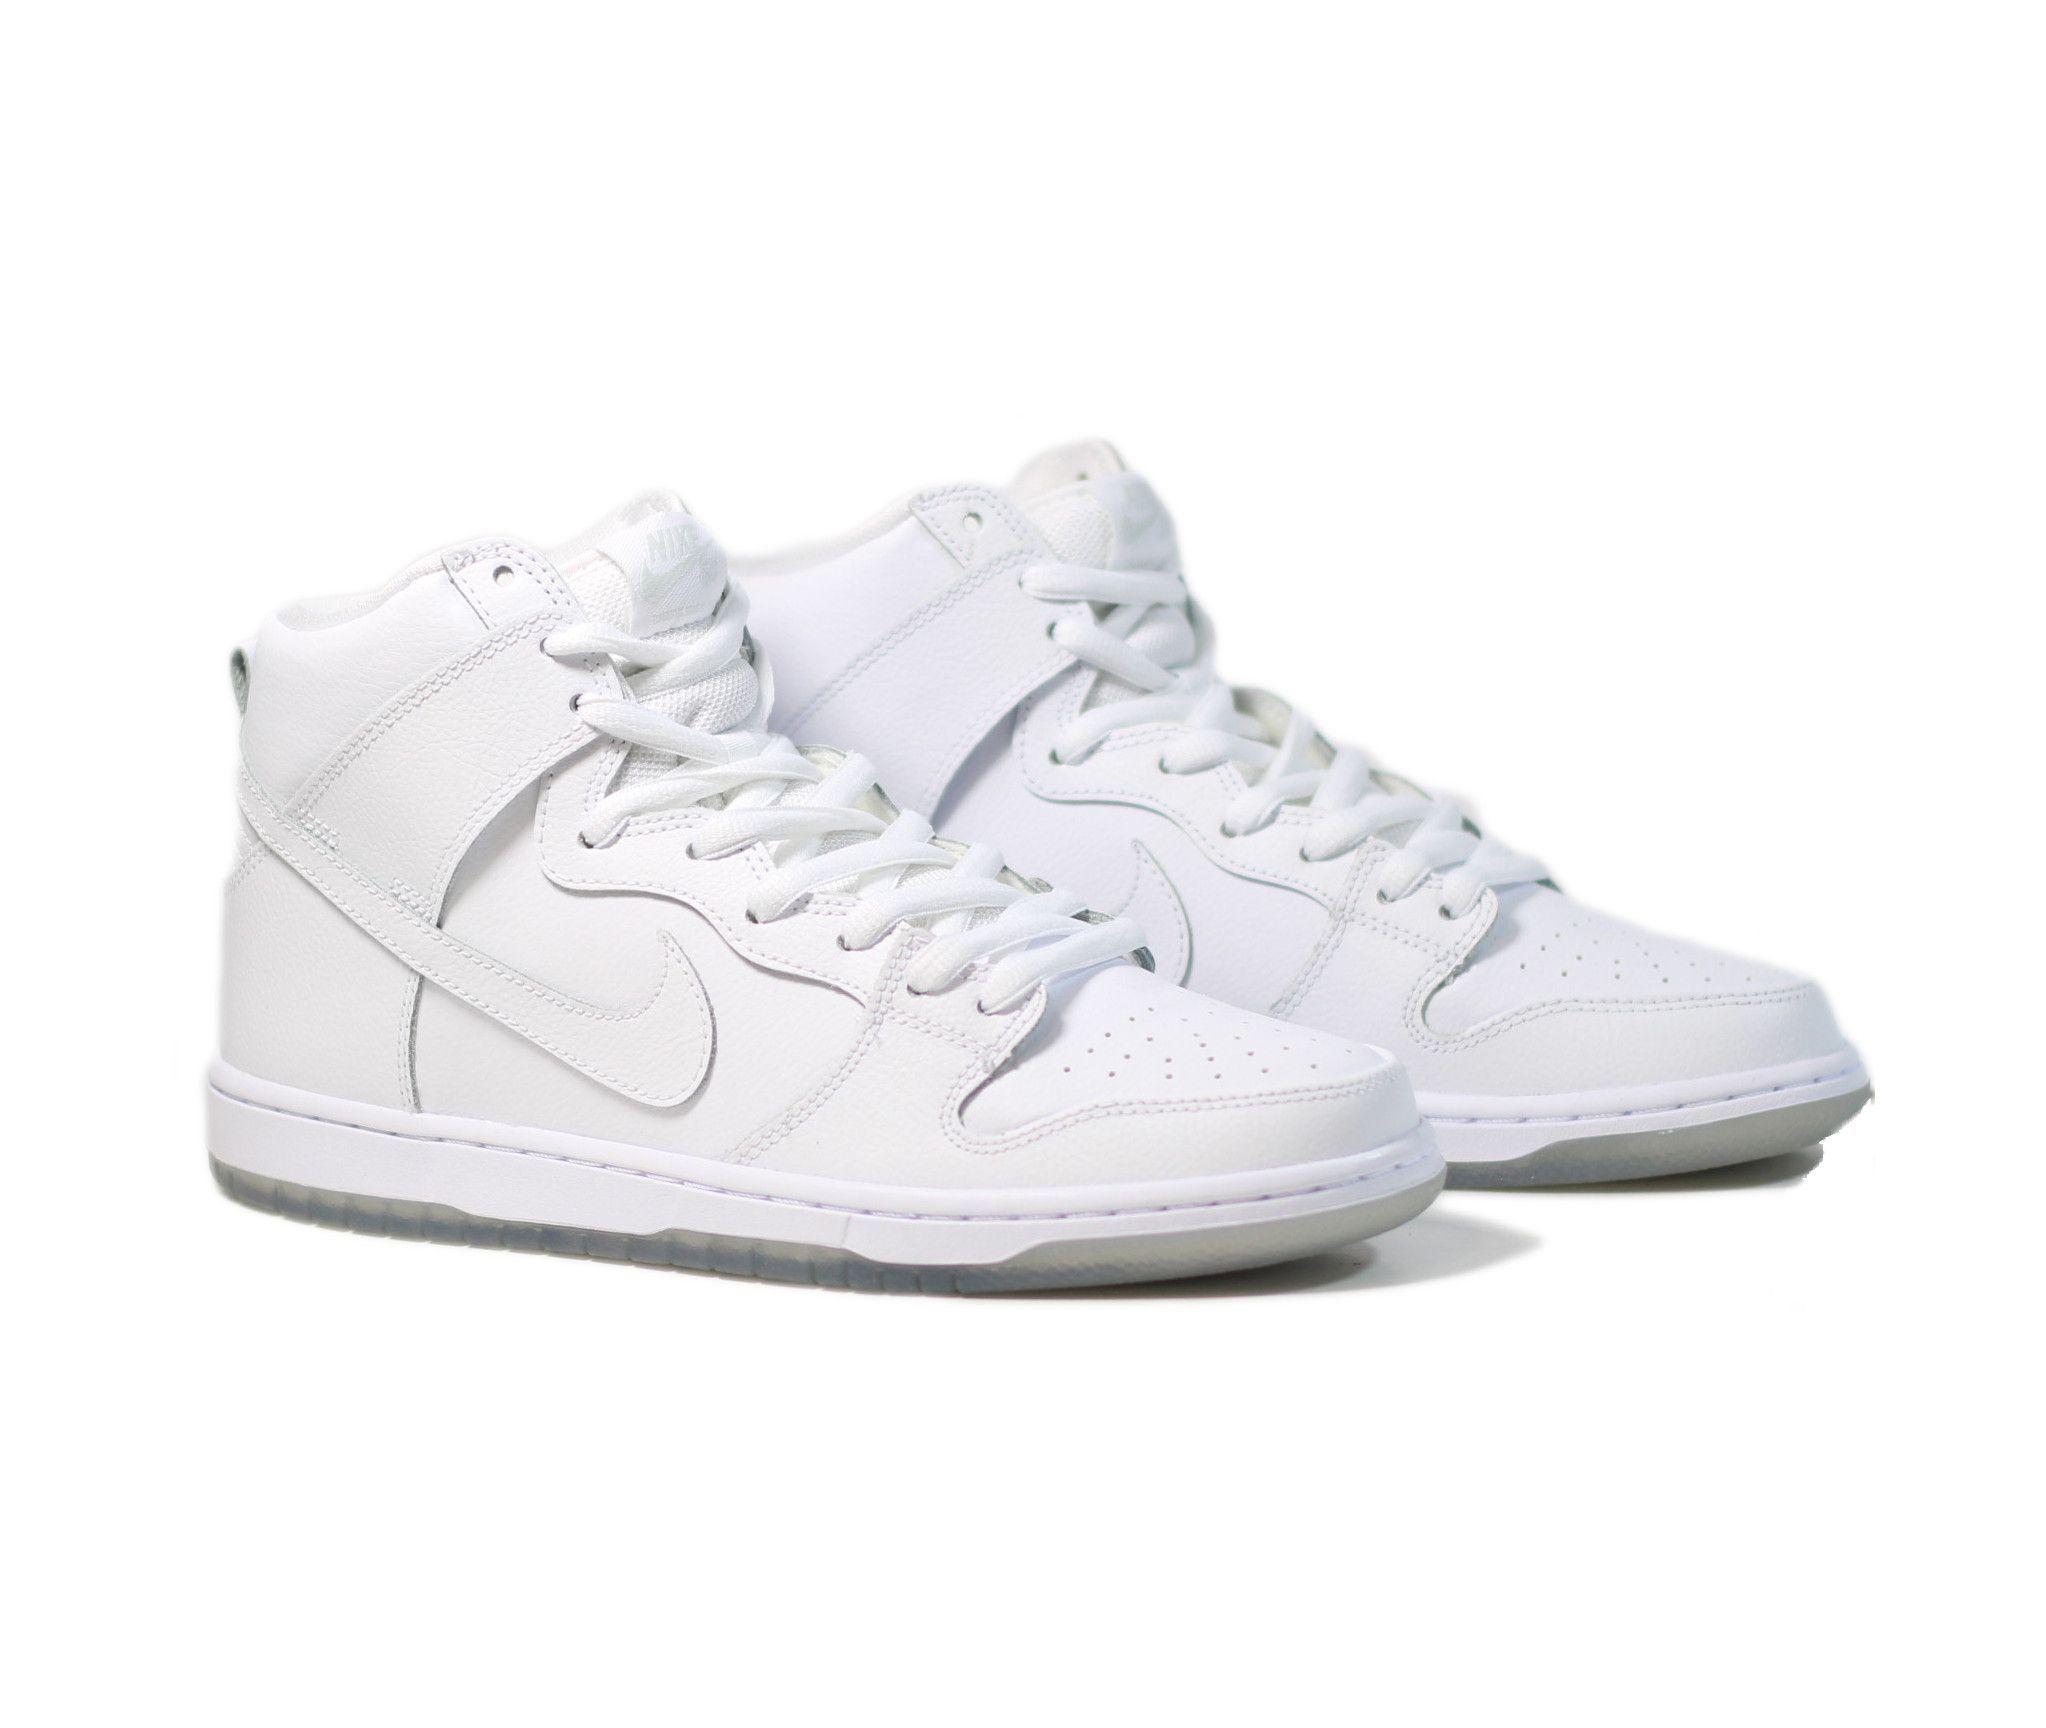 Nike SB Dunk High Pro -White/White-Ice